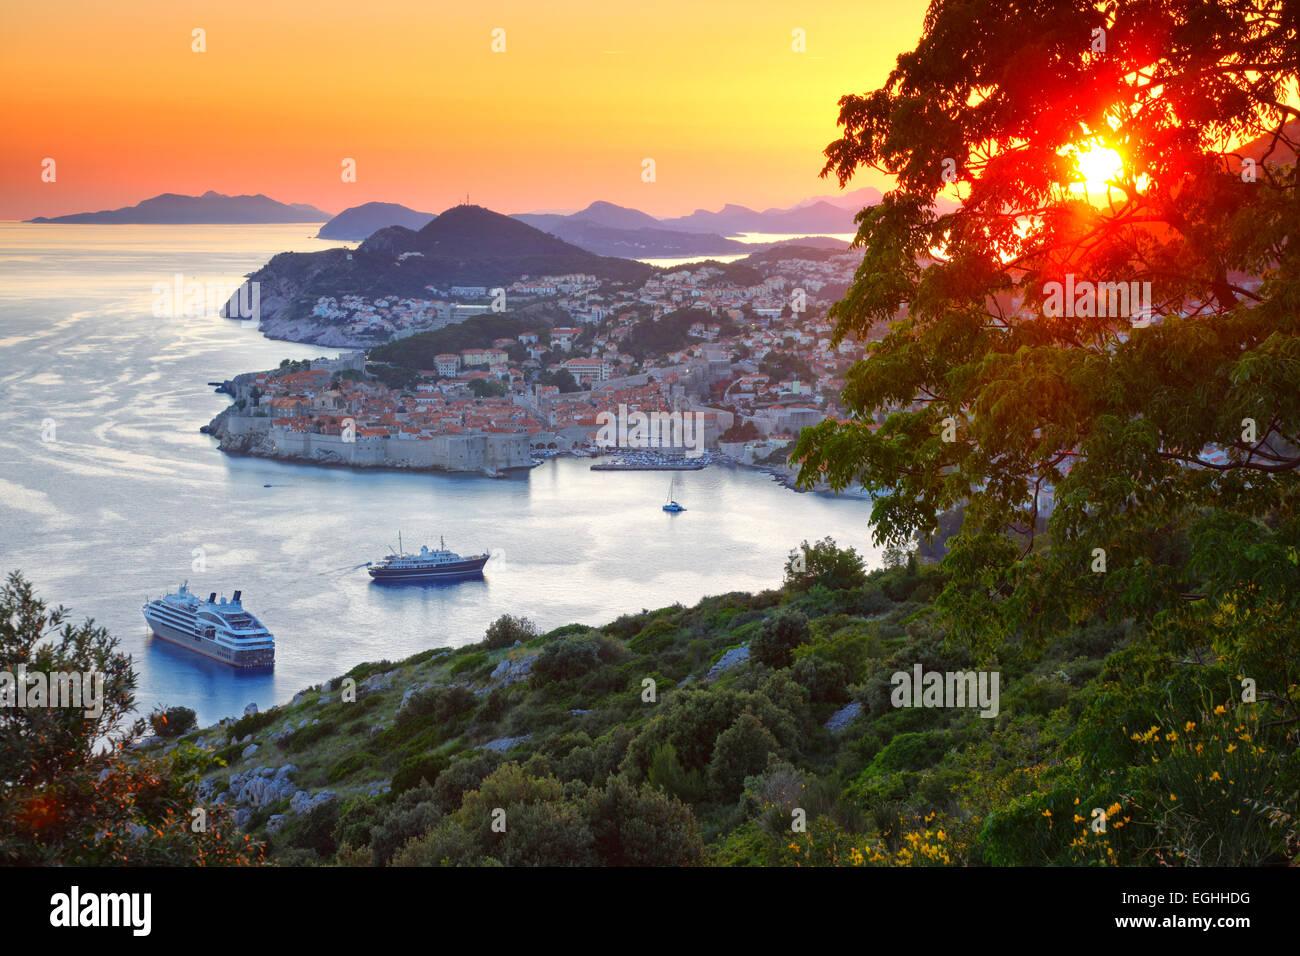 Panorama der Altstadt von Dubrovnik in Kroatien Sonnenuntergang. Stockbild